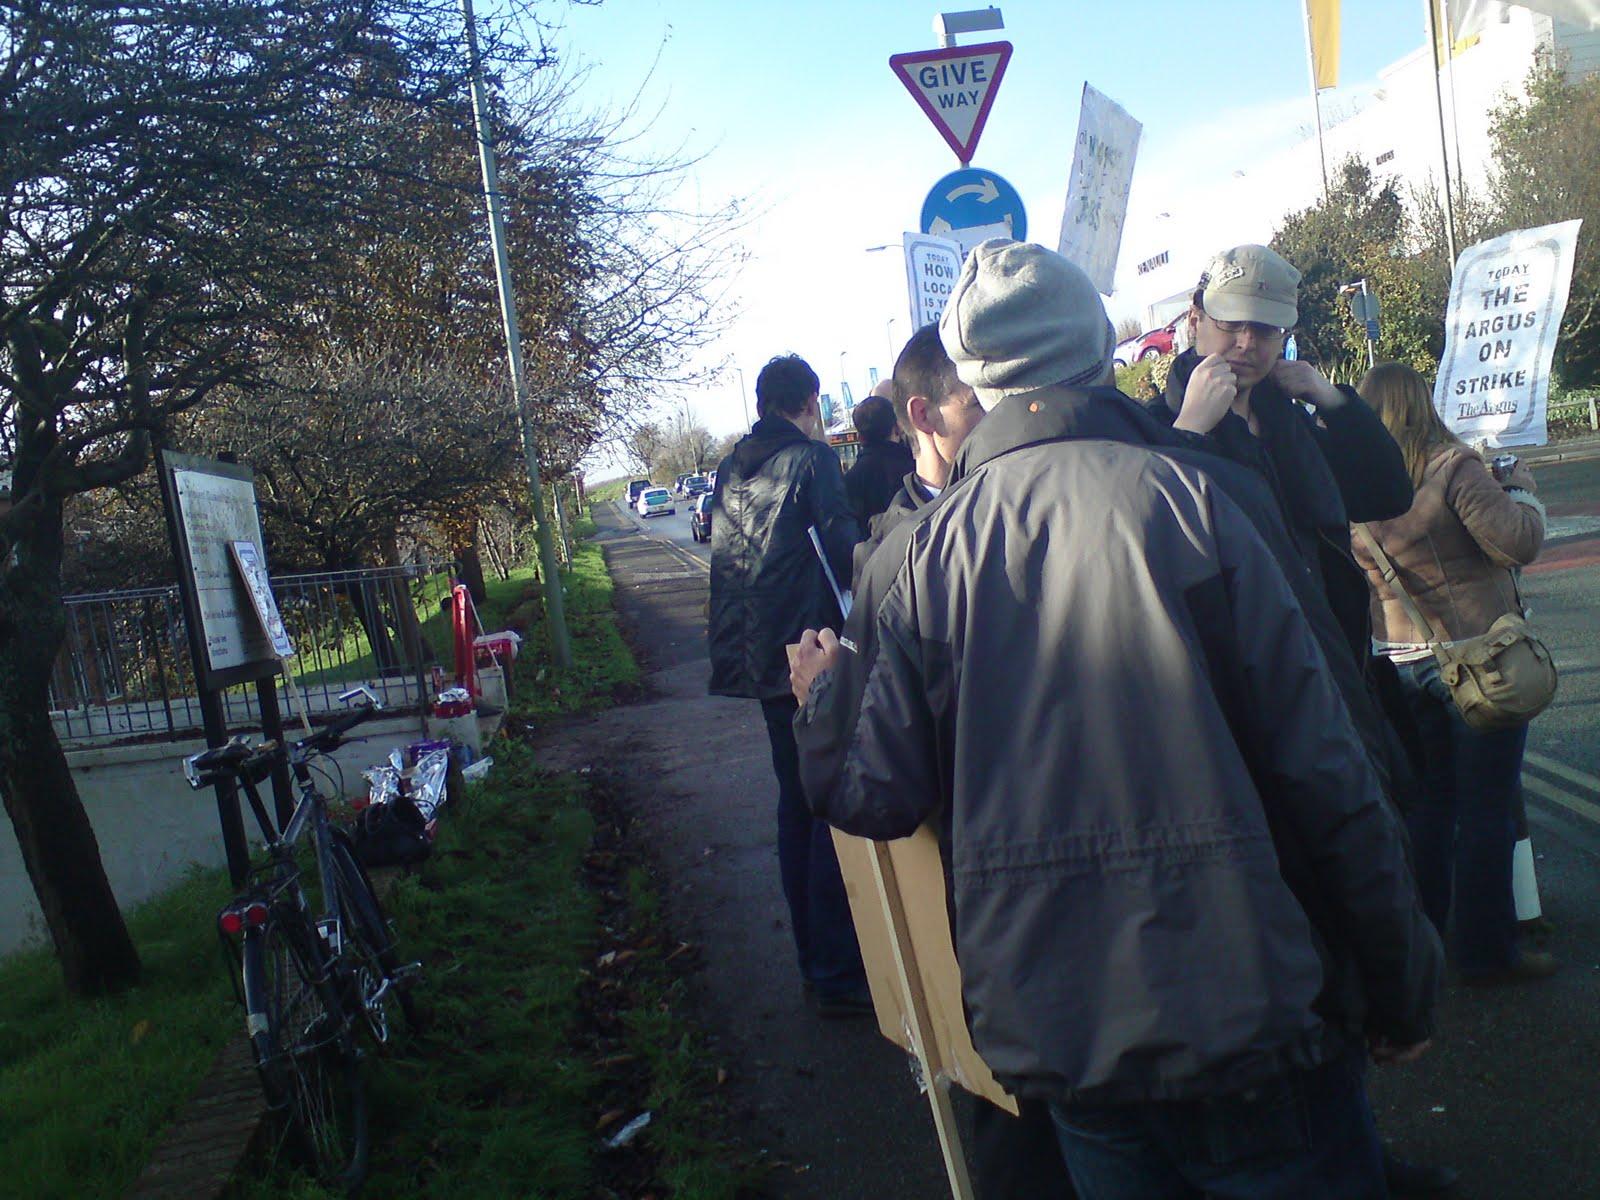 Tony Greenstein Blog: Tony Greenstein's Blog: Brighton & Hove Argus Journalists